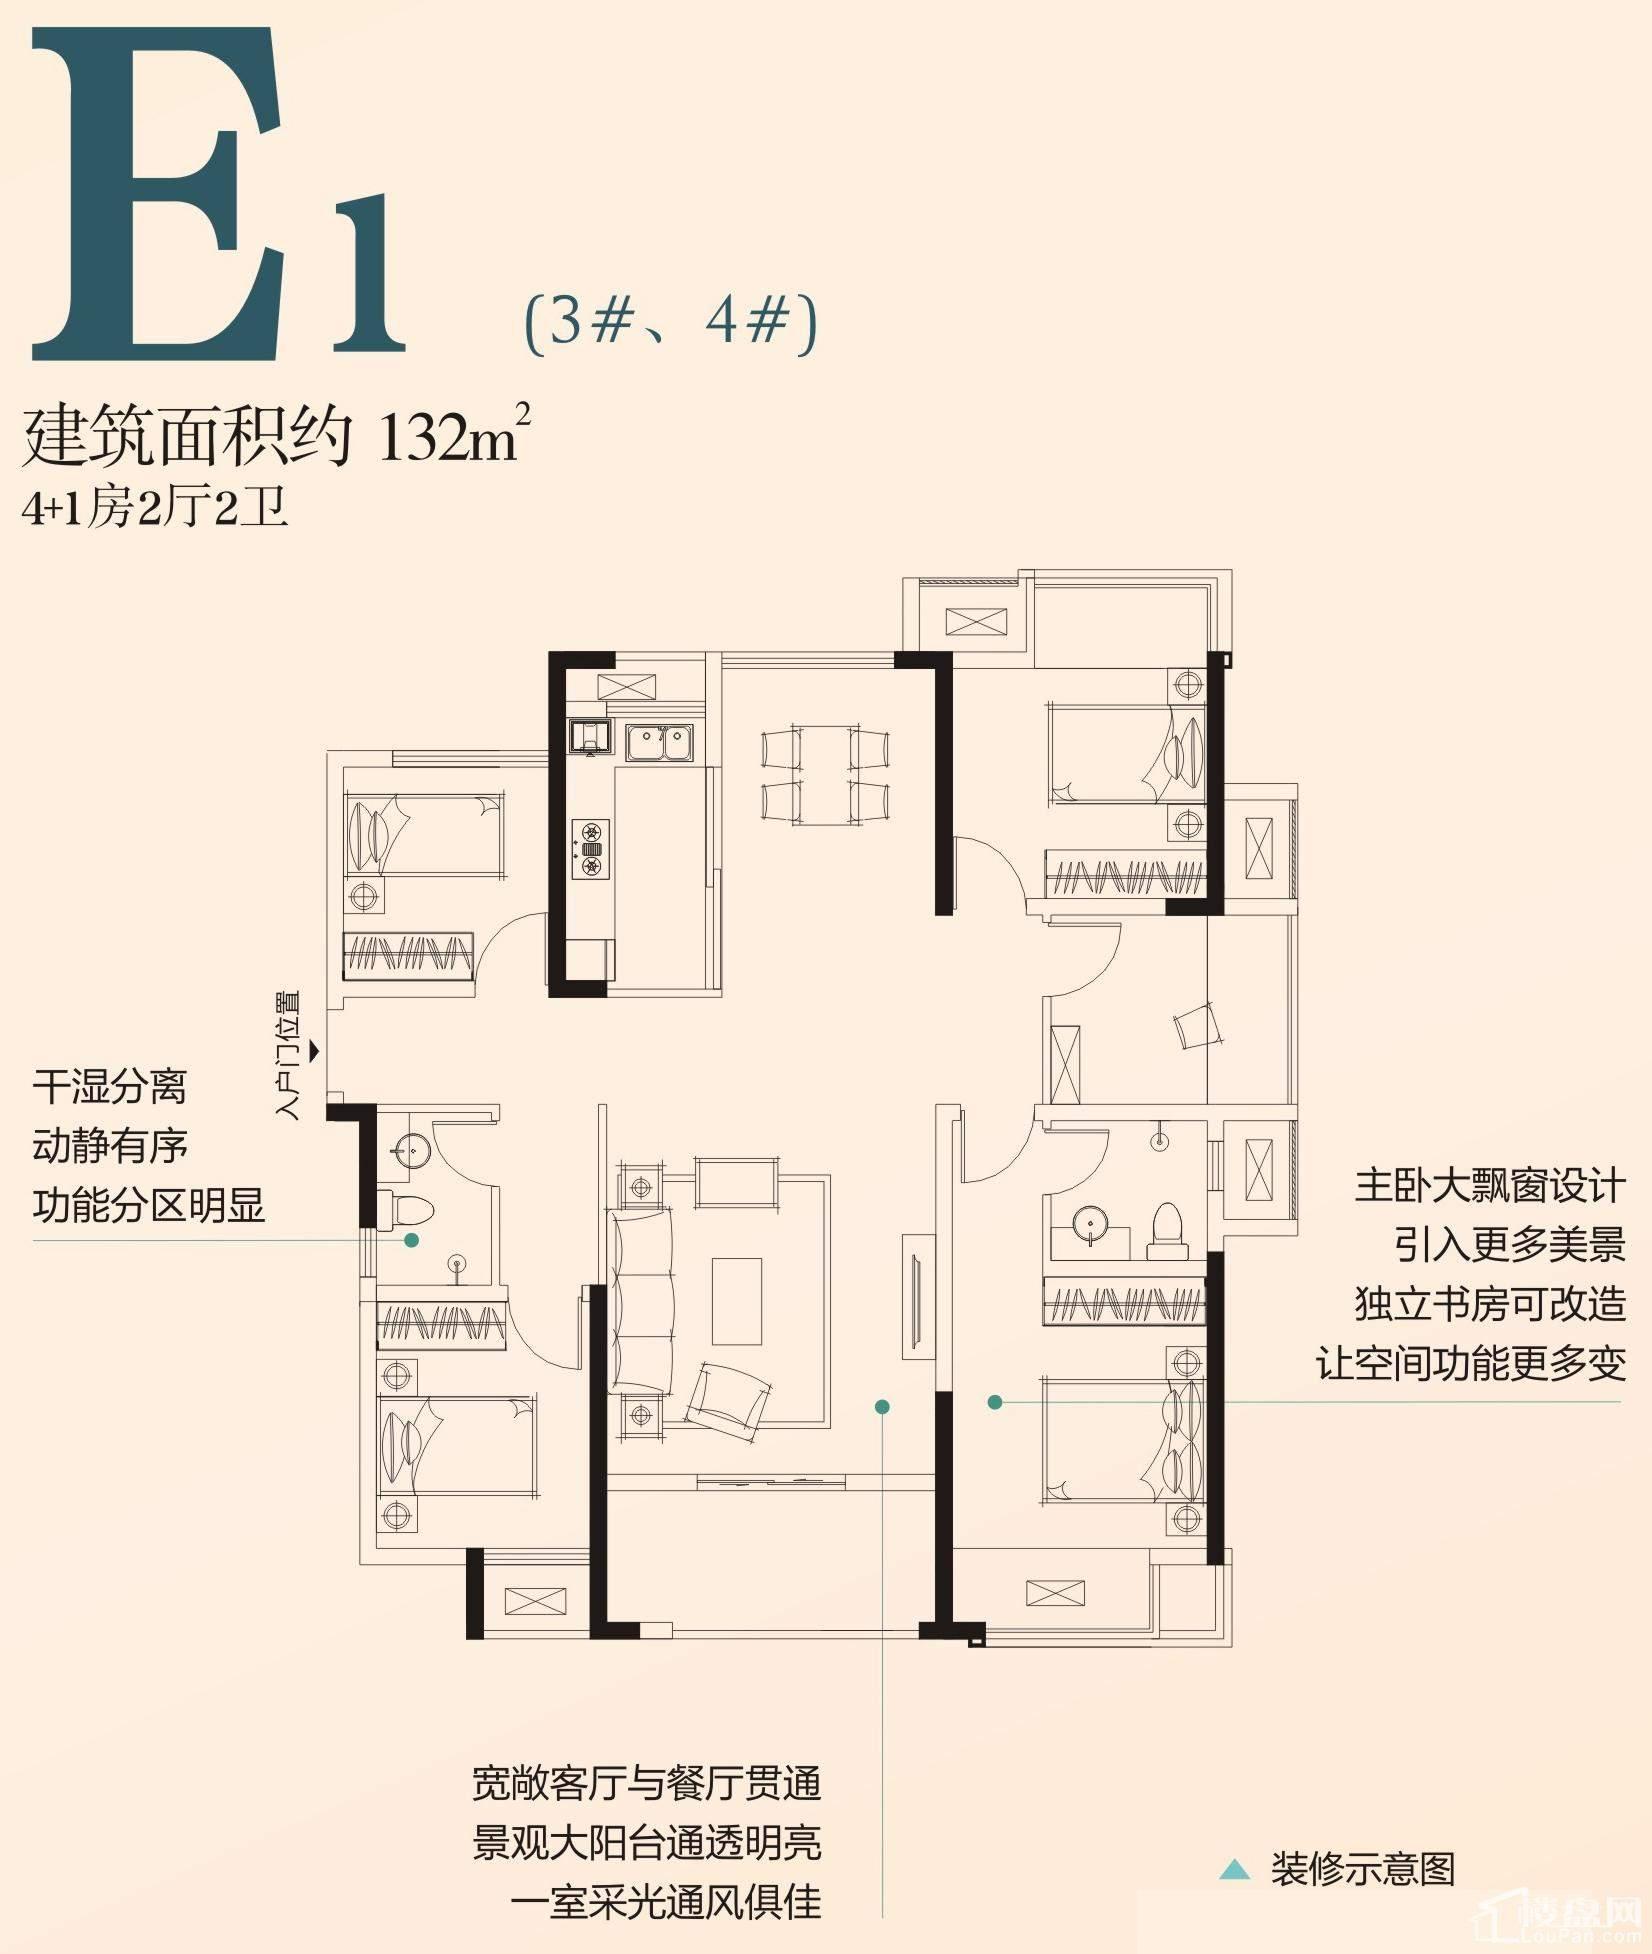 E1户型(3#、4#)